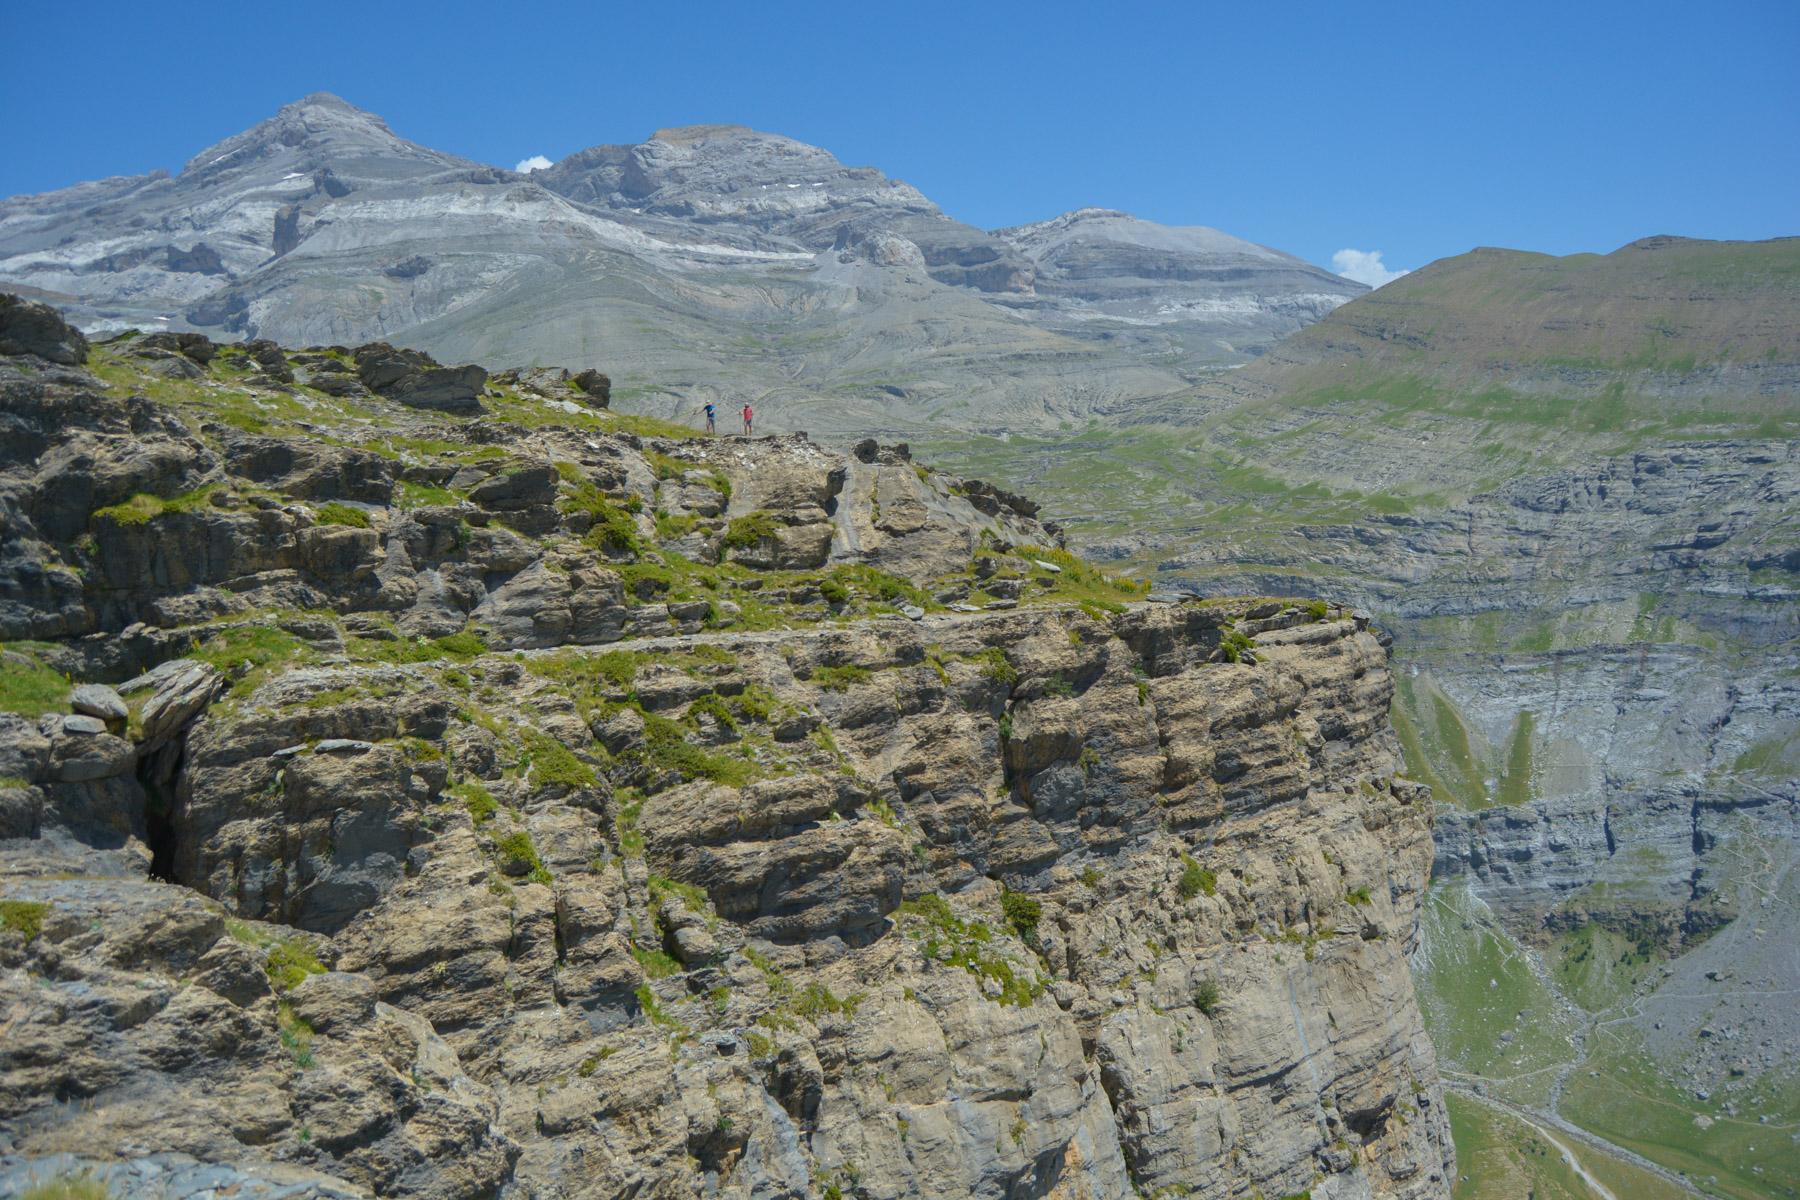 Monte Perdido et Faja de las Flores, Jour 2, Ordesa, Aragon, Espagne 26